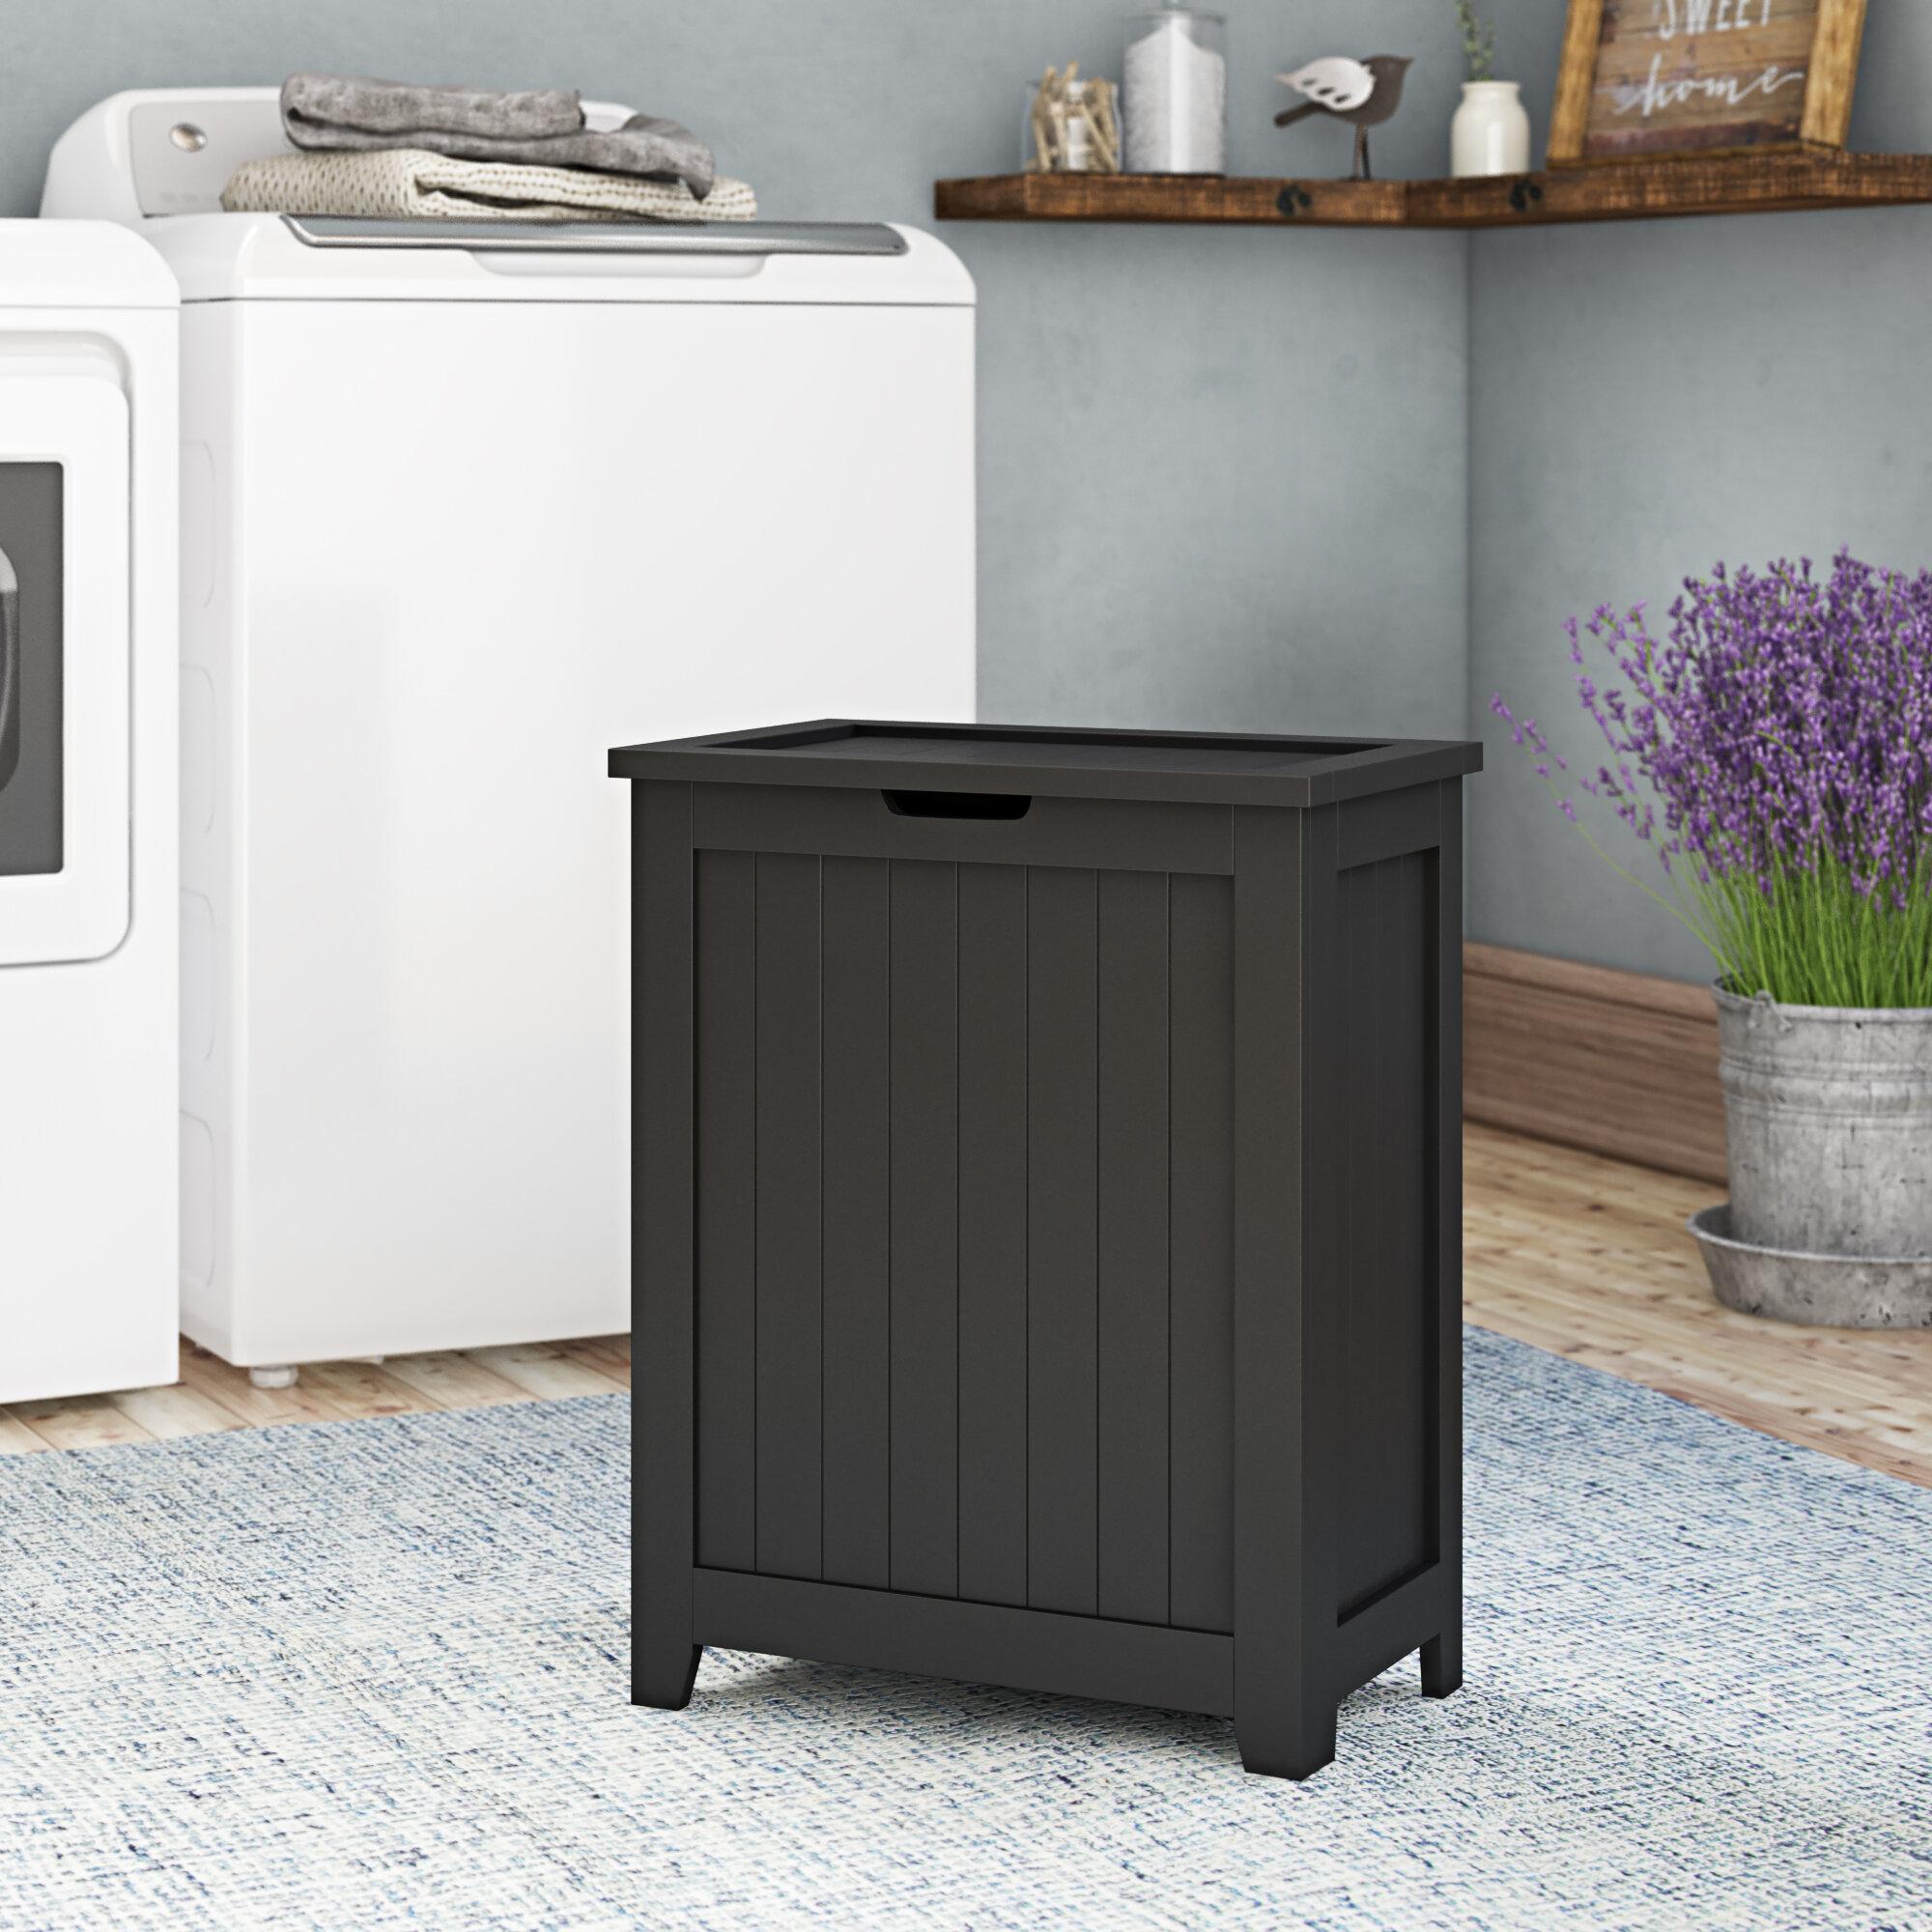 3 Liner 135L Laundry Cloth Hamper Sorter Basket Bin Foldable 3 Sections with Aluminum Frame 26/×24H Washing Storage Dirty Clothes Bag for Bathroom Bedroom Home